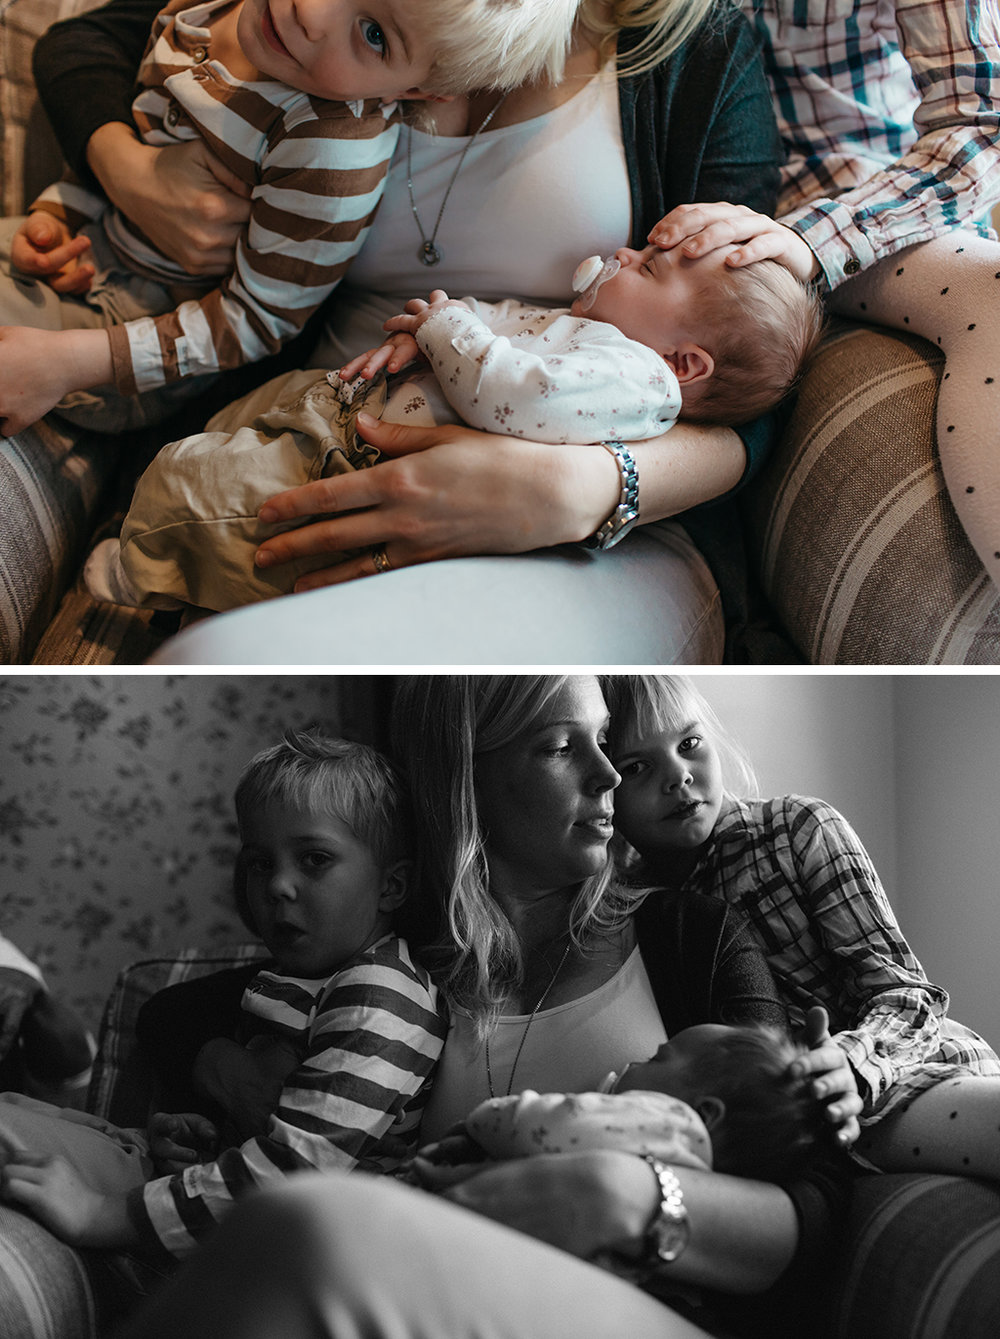 Nyfoddfotografering-lifestyle-familjefotografering-Stockholm-4.jpg